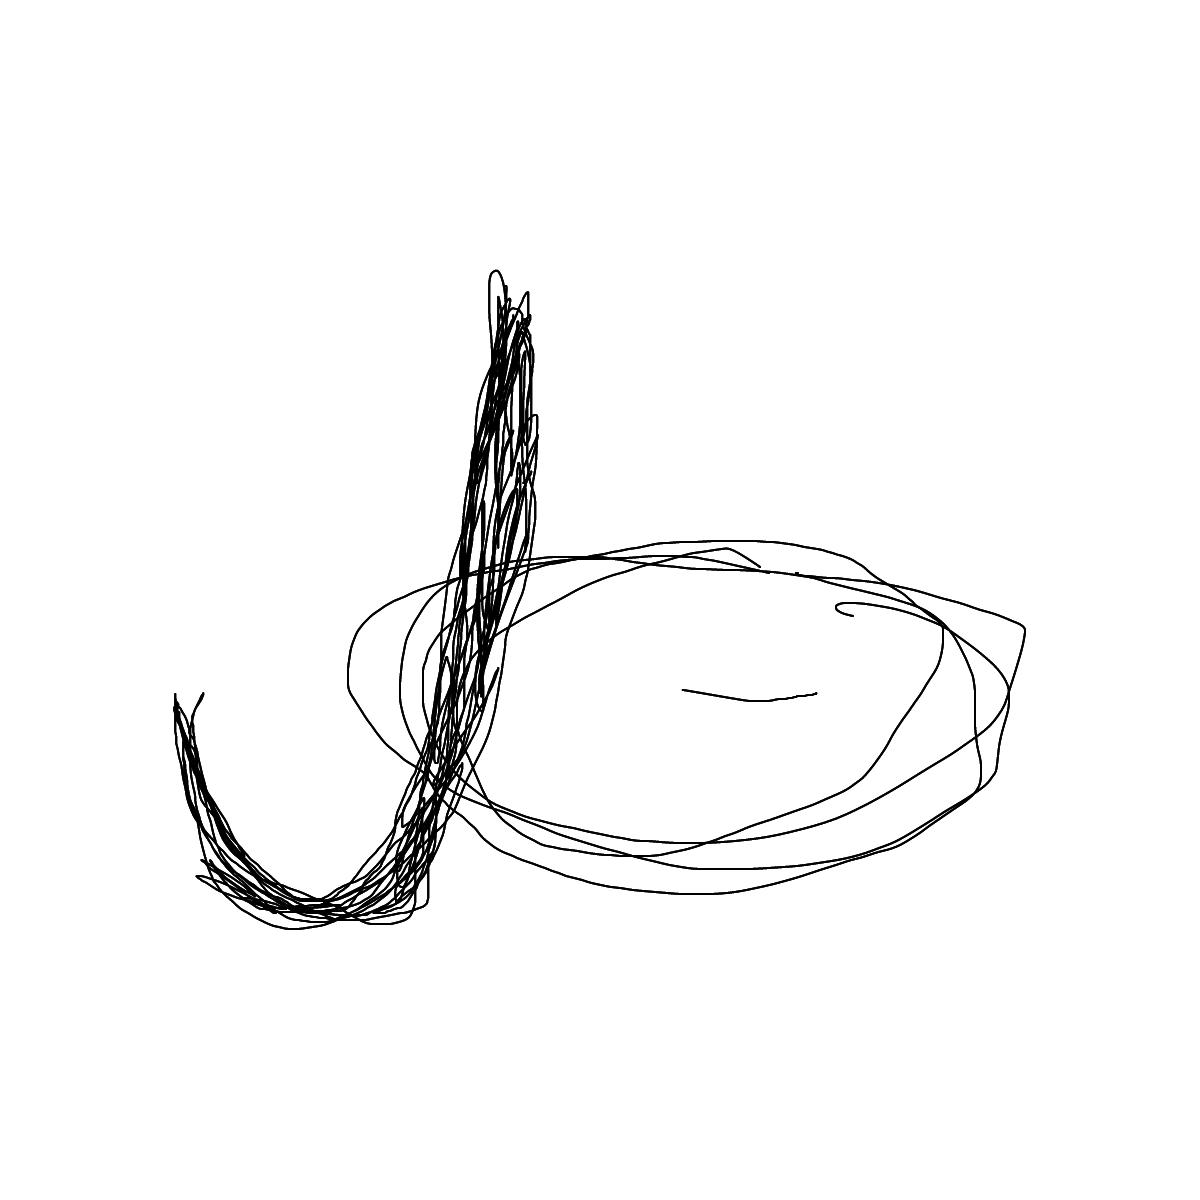 BAAAM drawing#8580 lat:59.9234886169433600lng: 10.7576990127563480